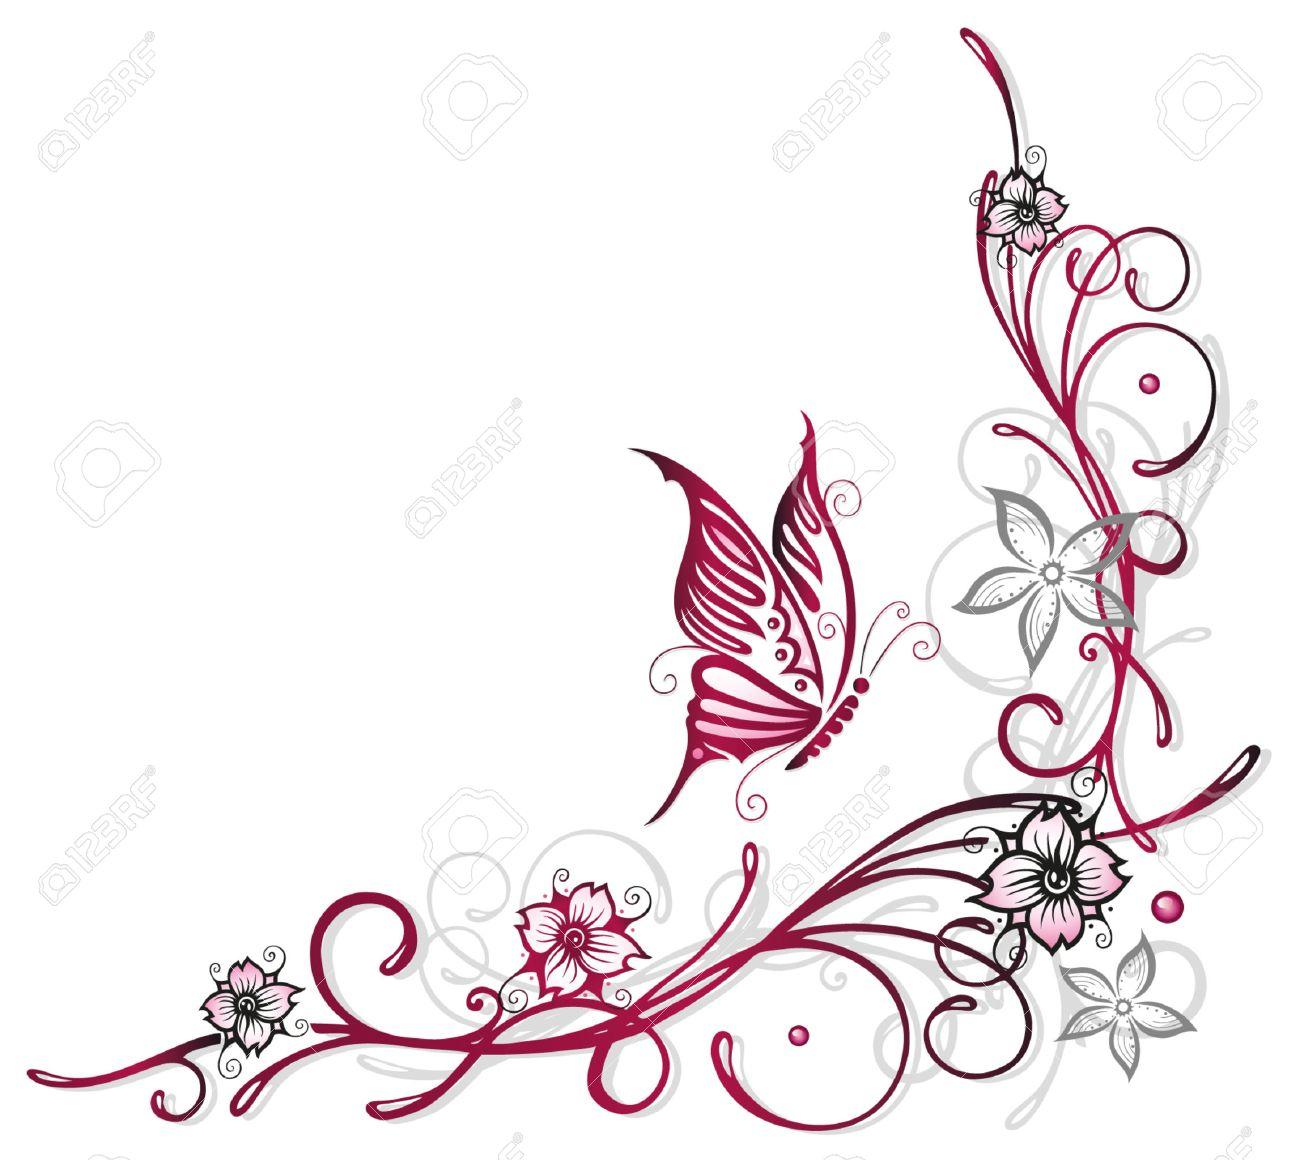 Floral element, cherry blossoms, spring time Standard-Bild - 23898923